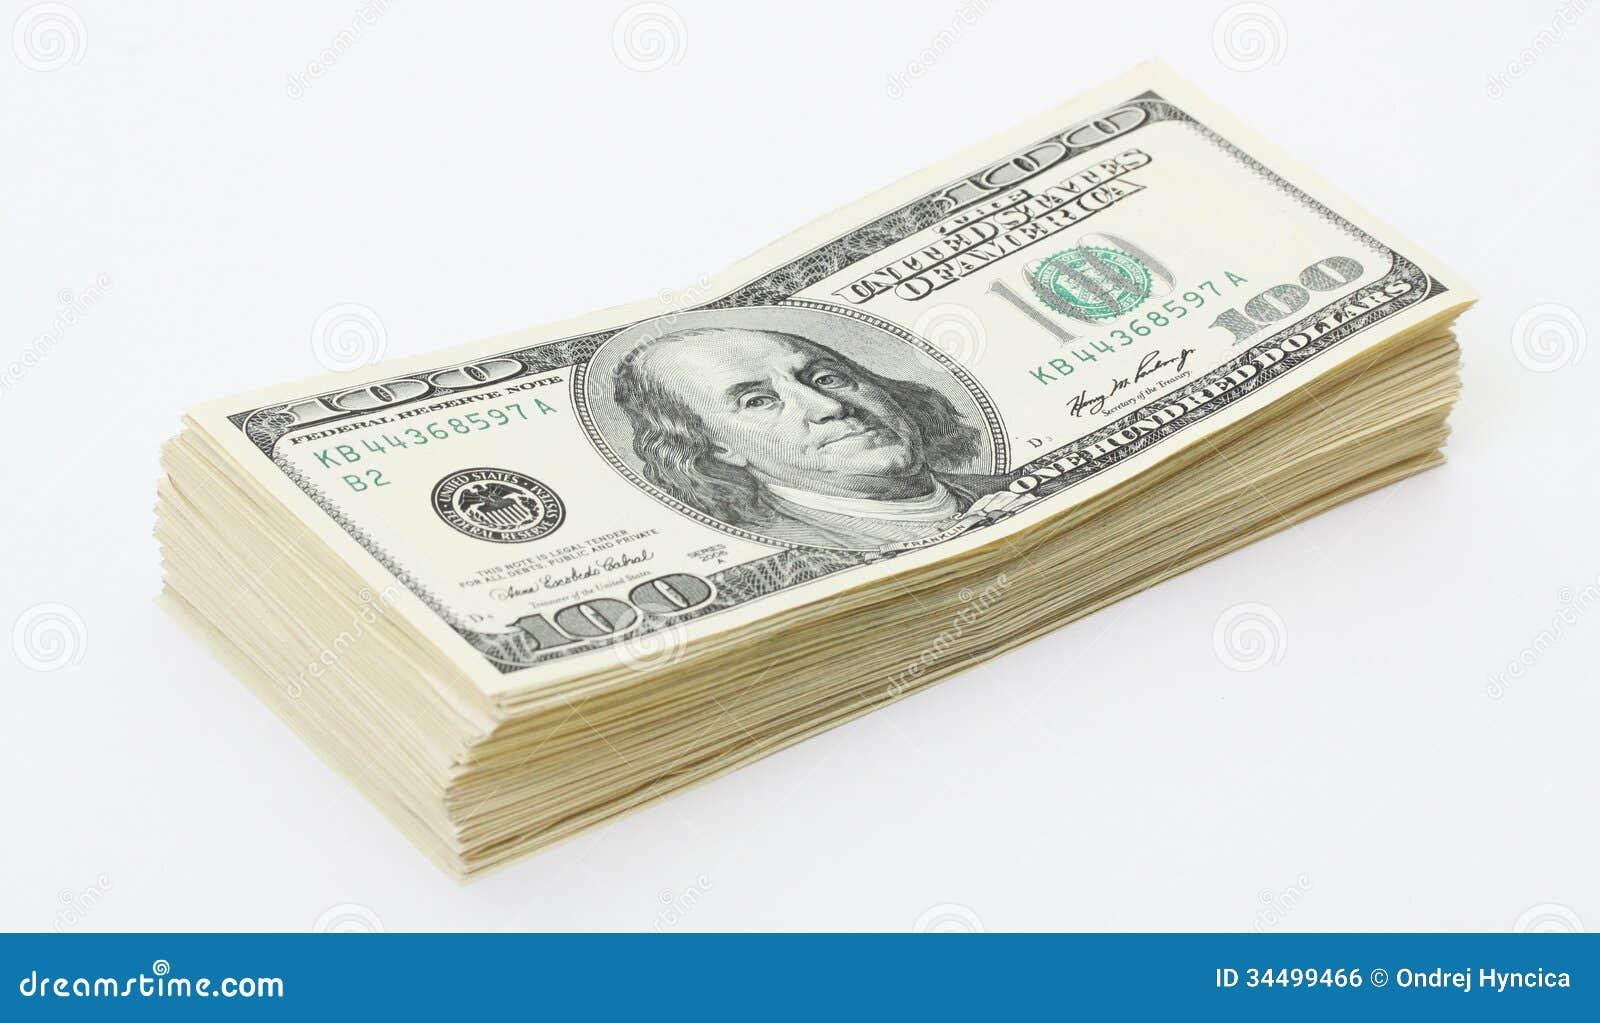 stack of money american hunderd dollar bills royalty free